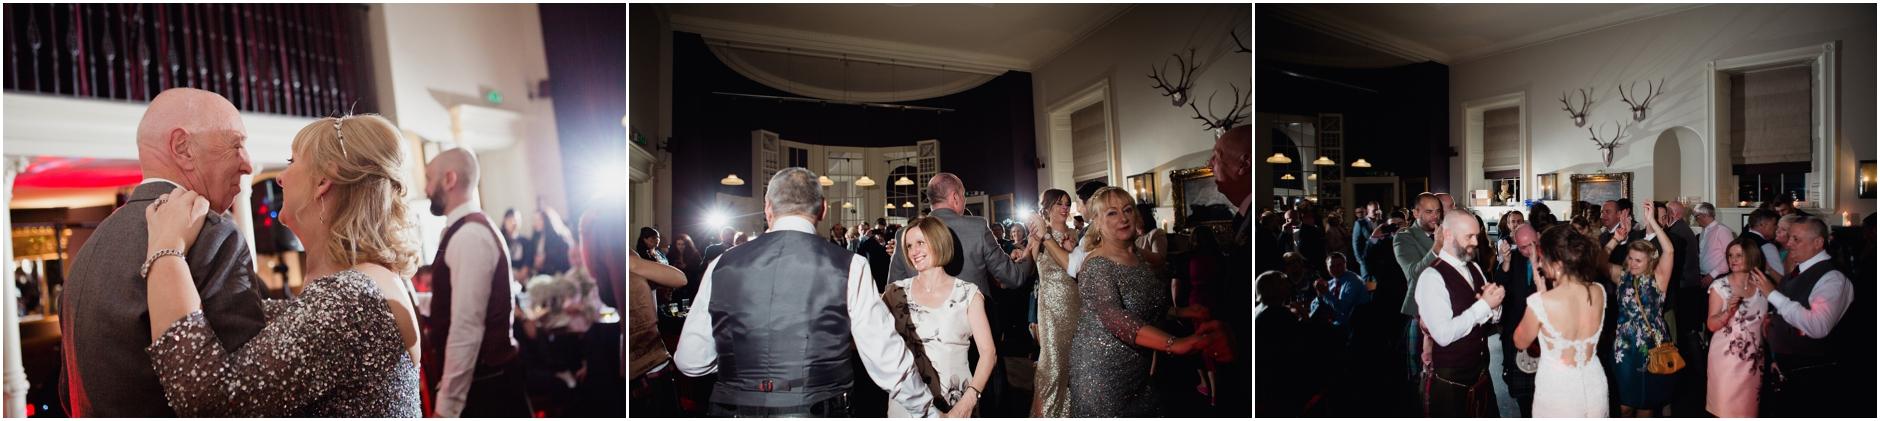 howies natural edinburgh wedding photographs